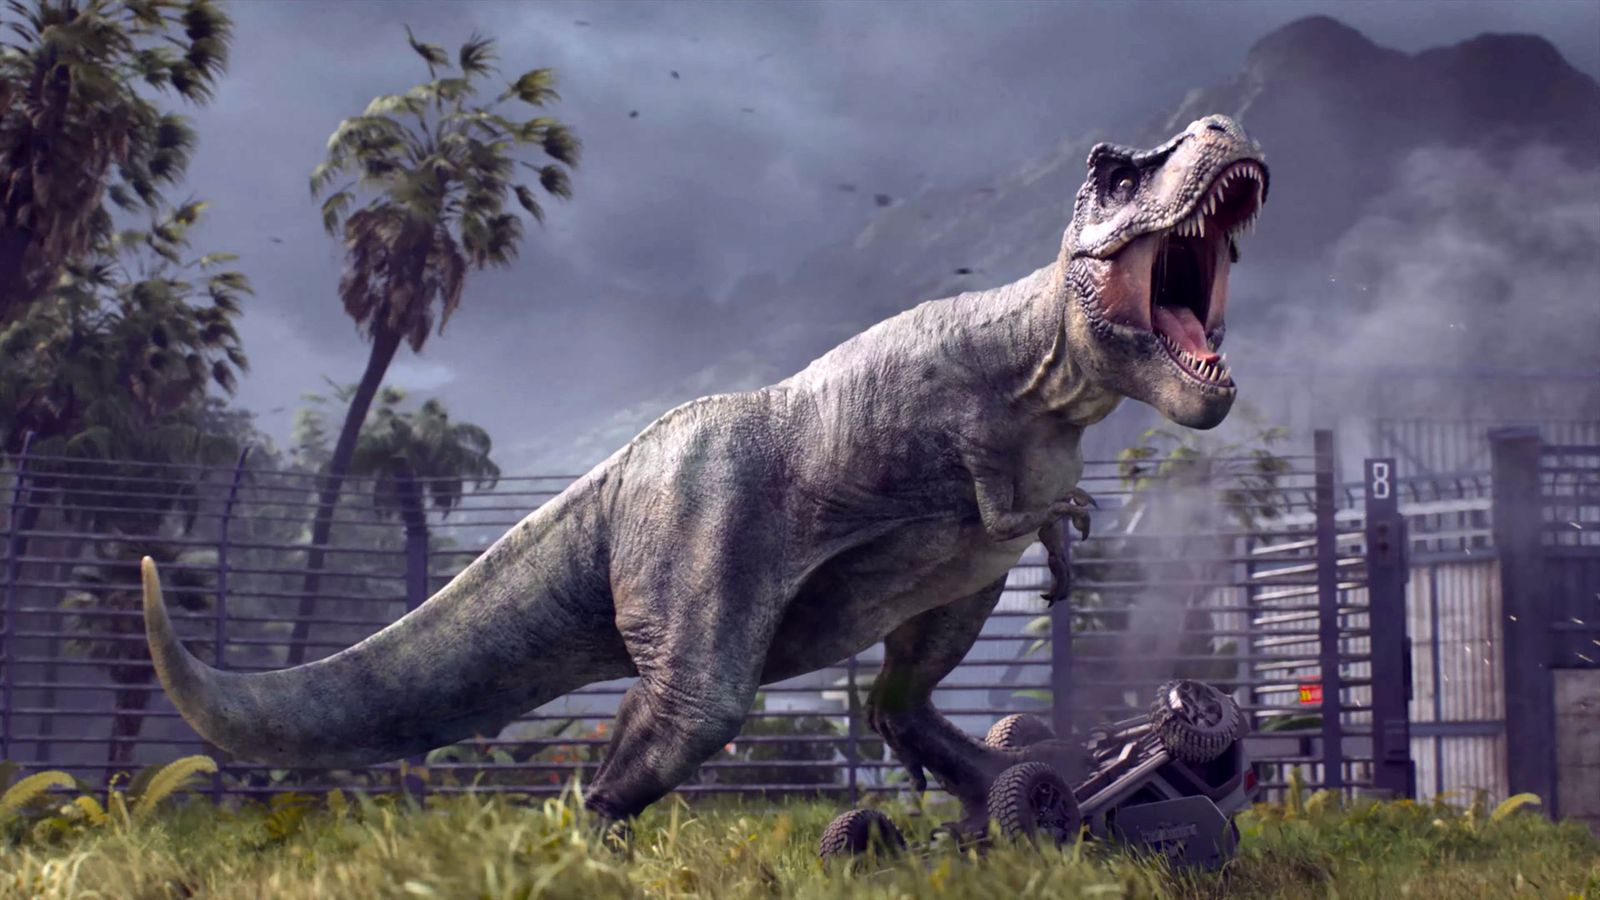 Jurassic World park sim coming from Planet Coaster developer Polygon